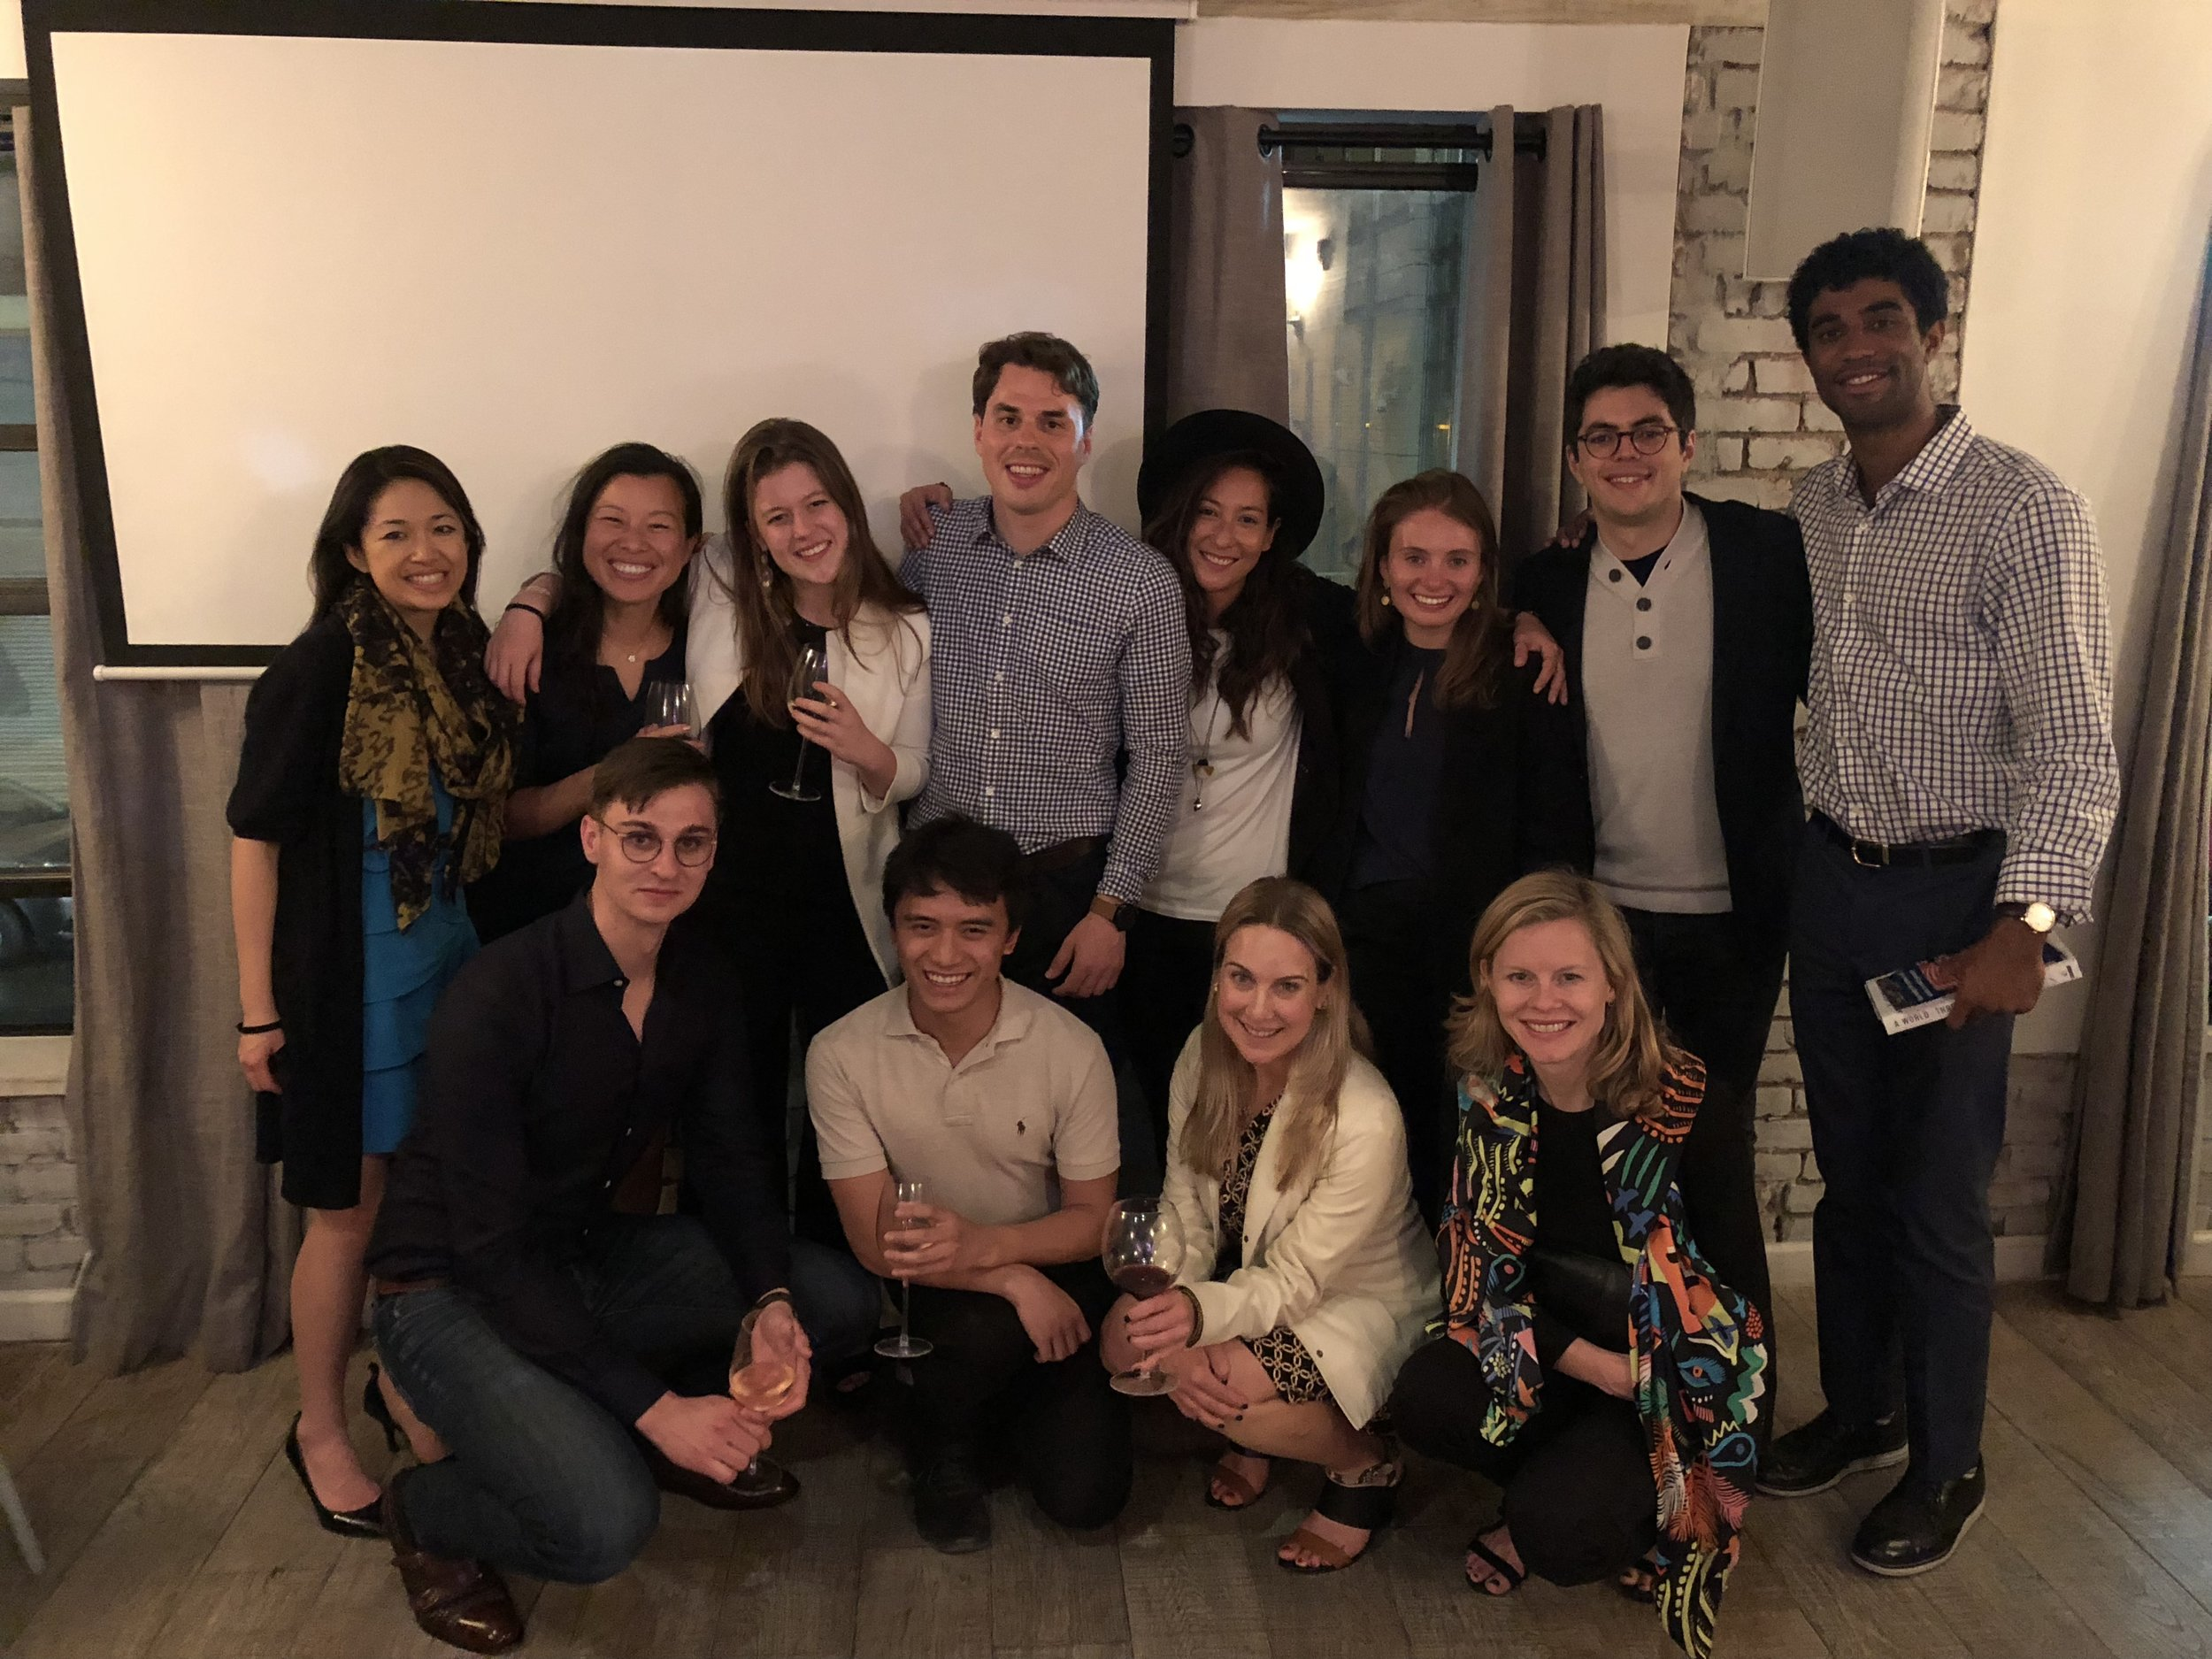 Friends of Yunus Social Business in New York